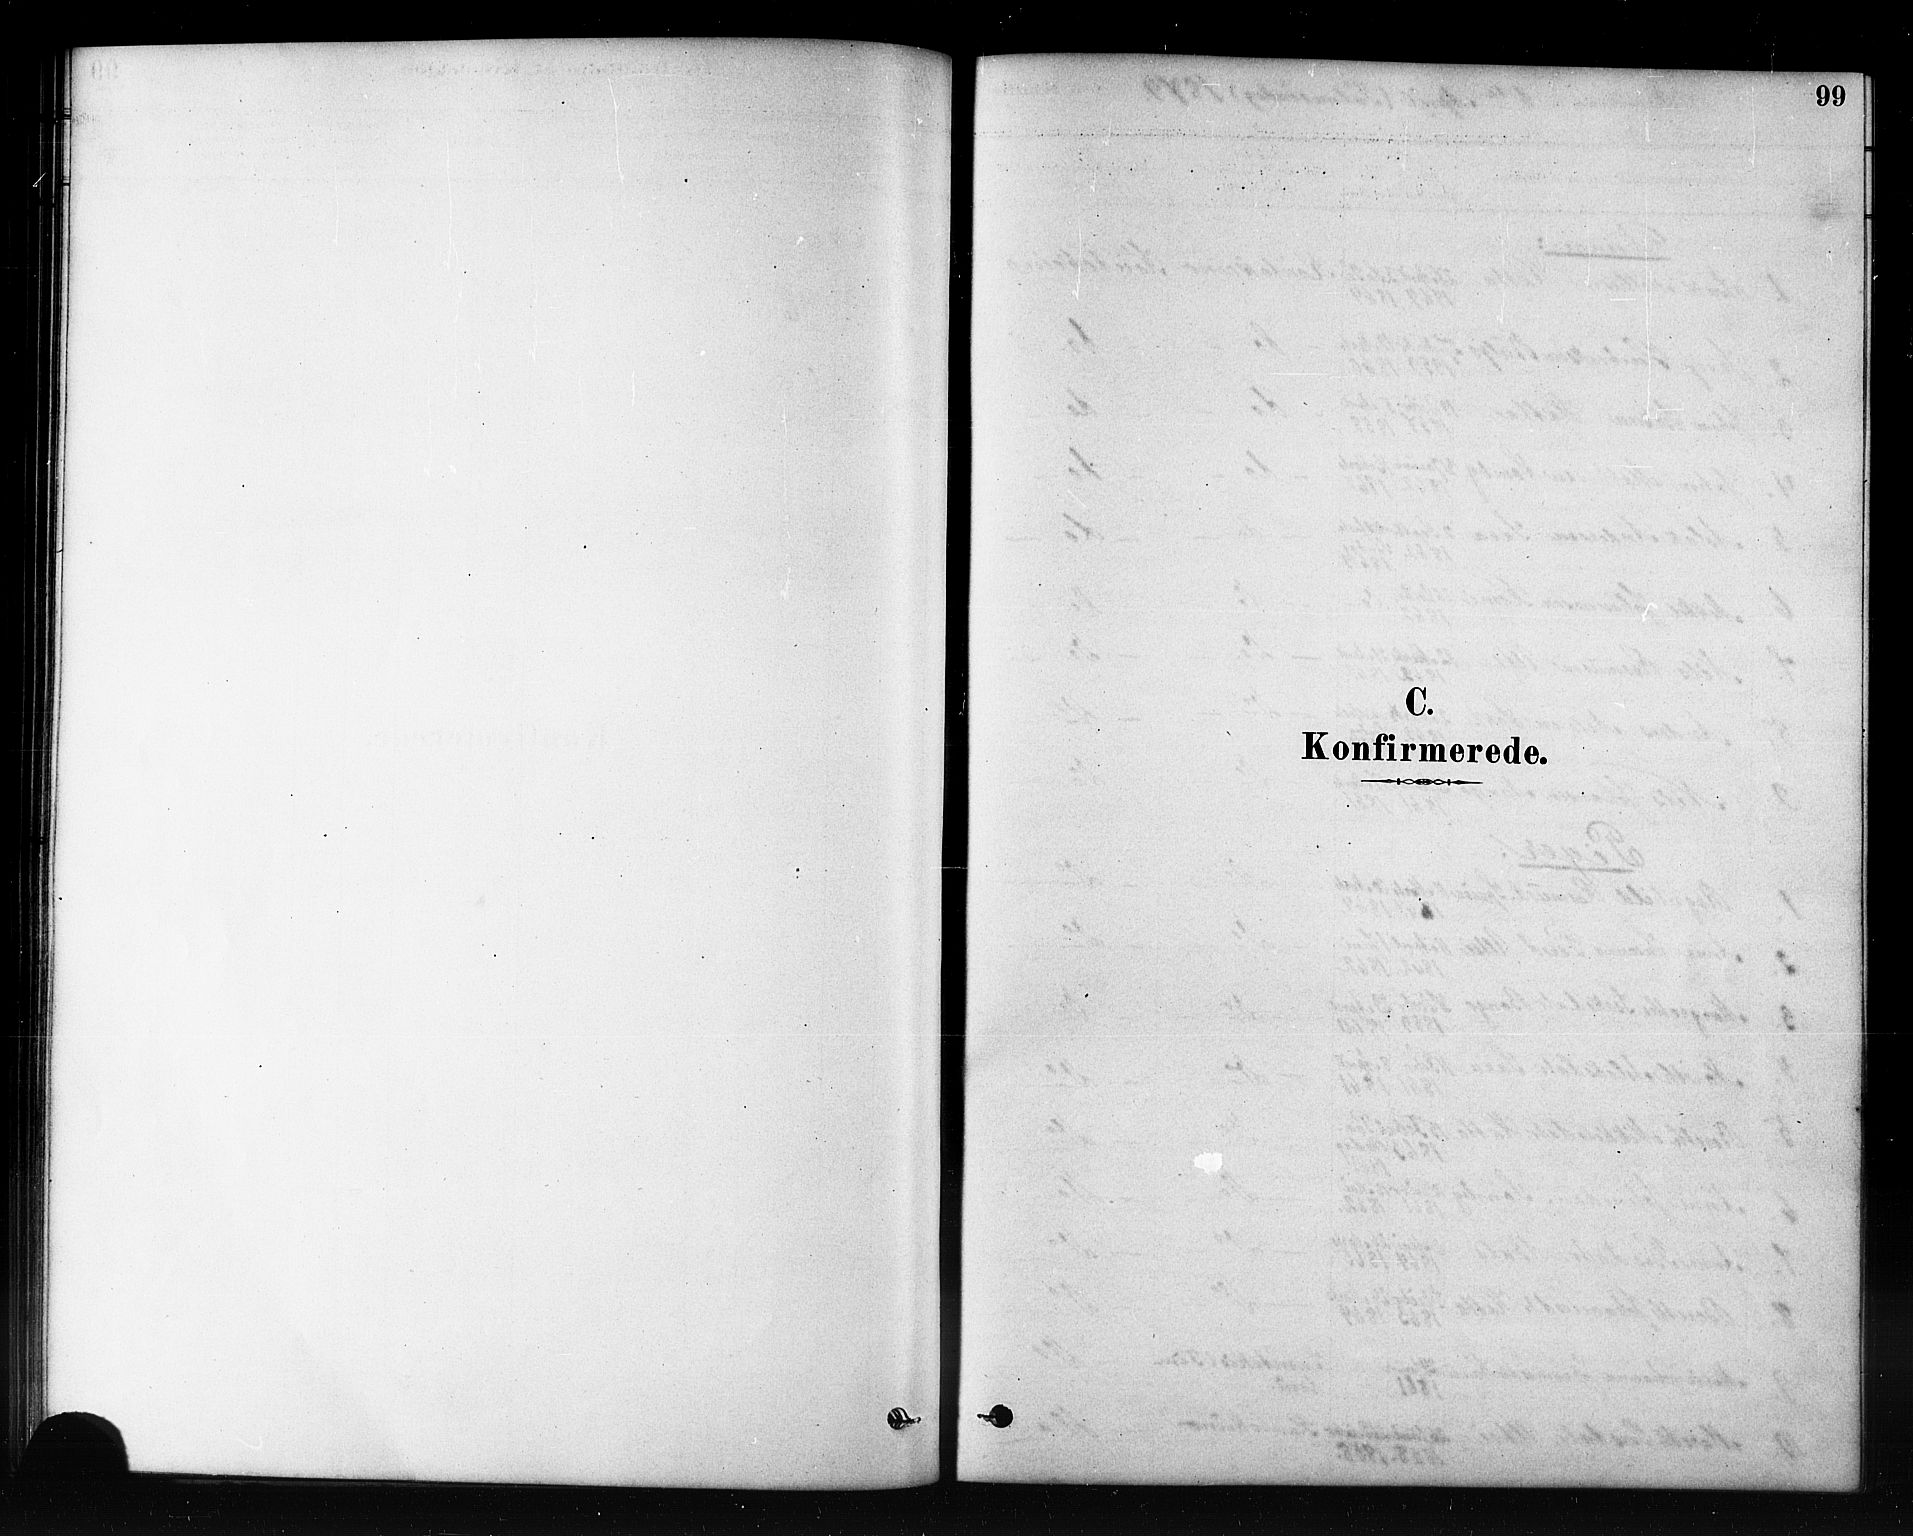 SATØ, Kautokeino sokneprestembete, H/Hb/L0002.klokk: Klokkerbok nr. 2, 1877-1896, s. 99